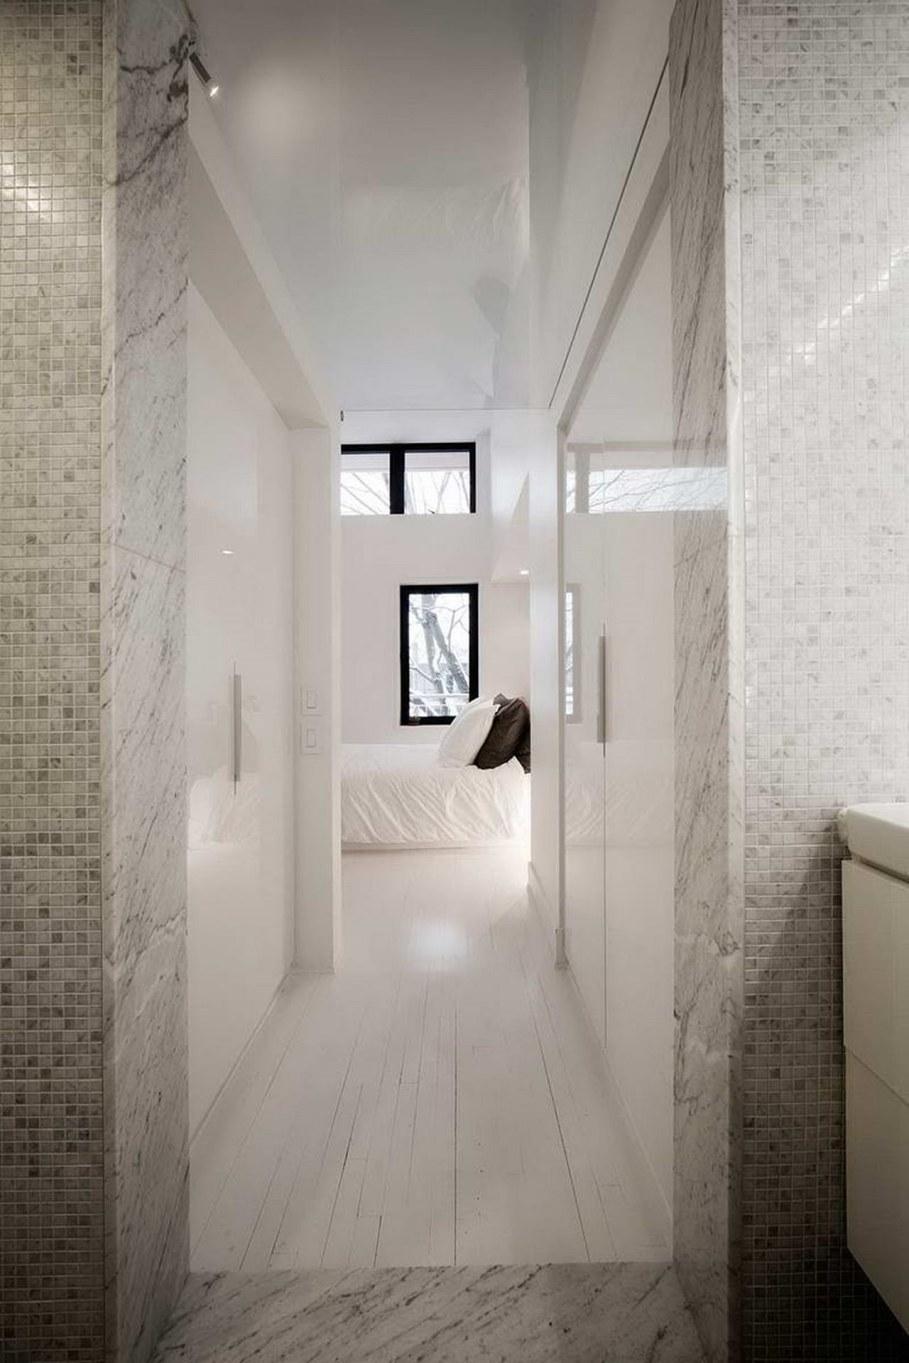 Juliette aux combles - bedroom and bathroom